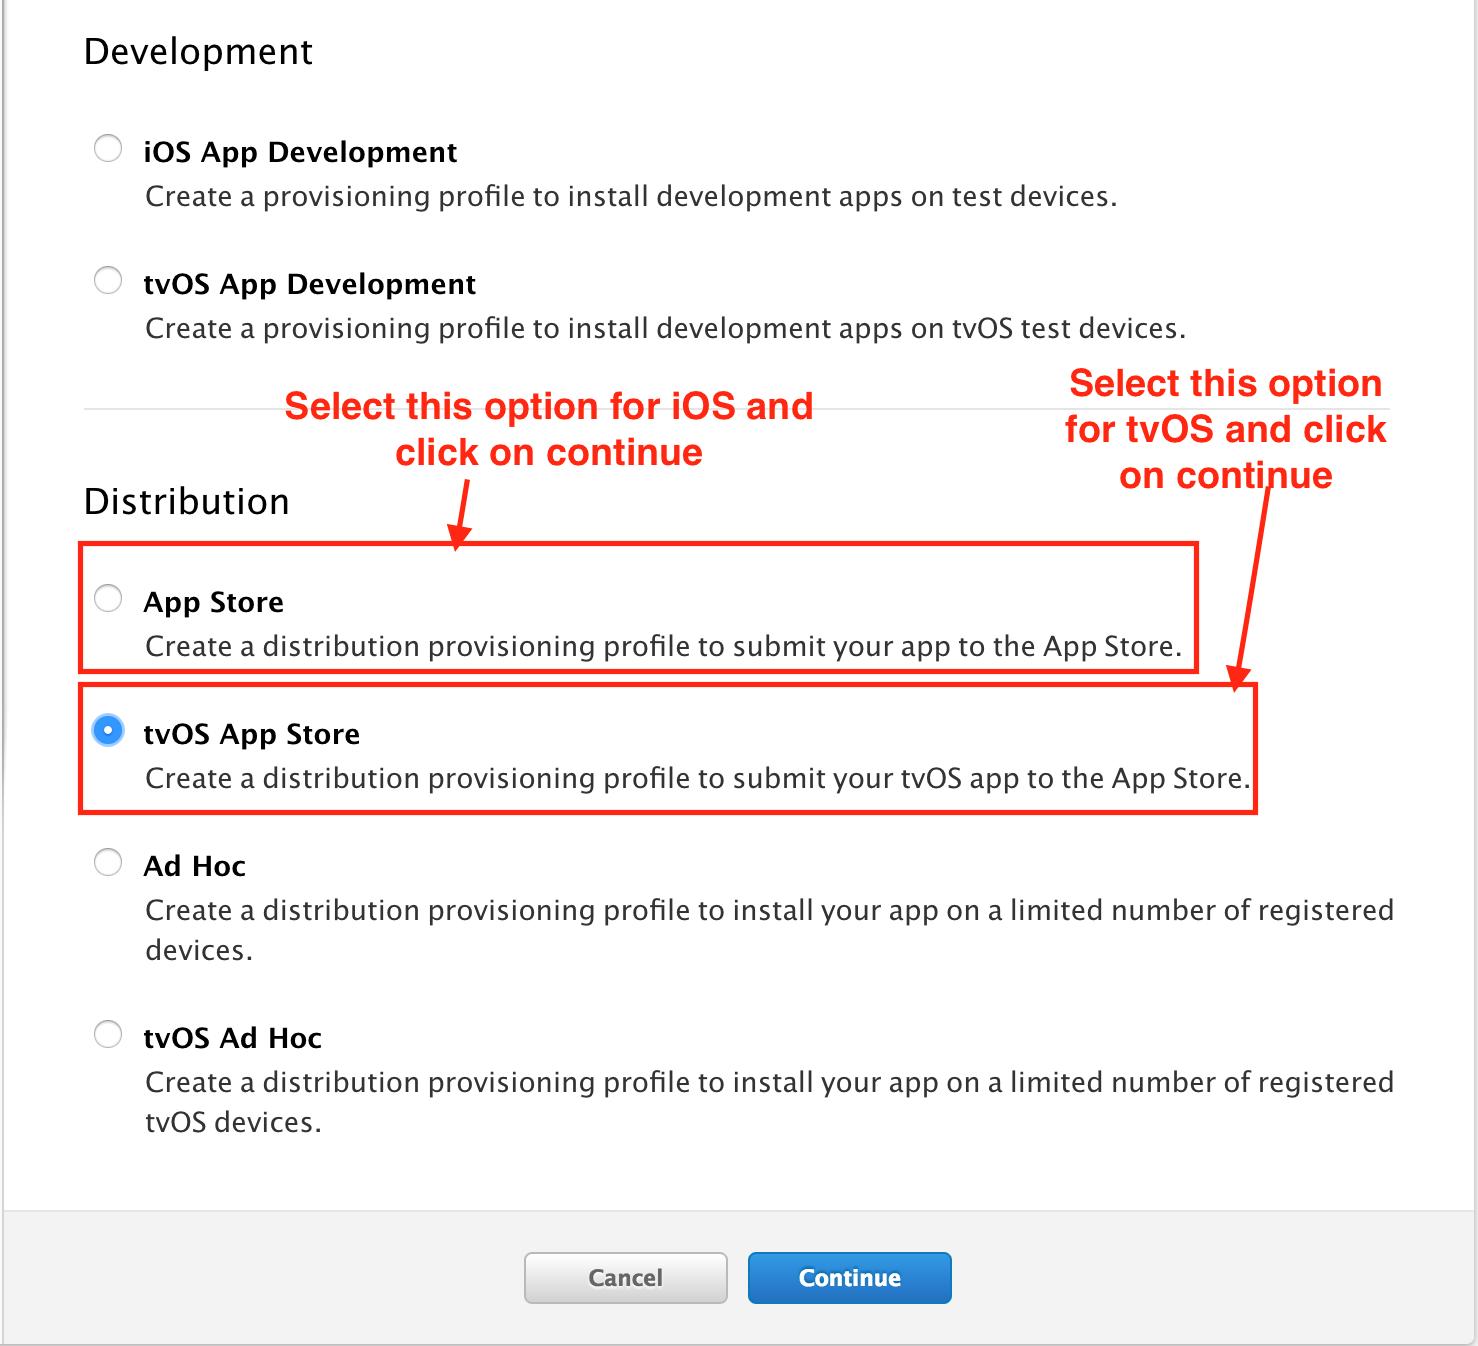 App Store- tvOS App Store